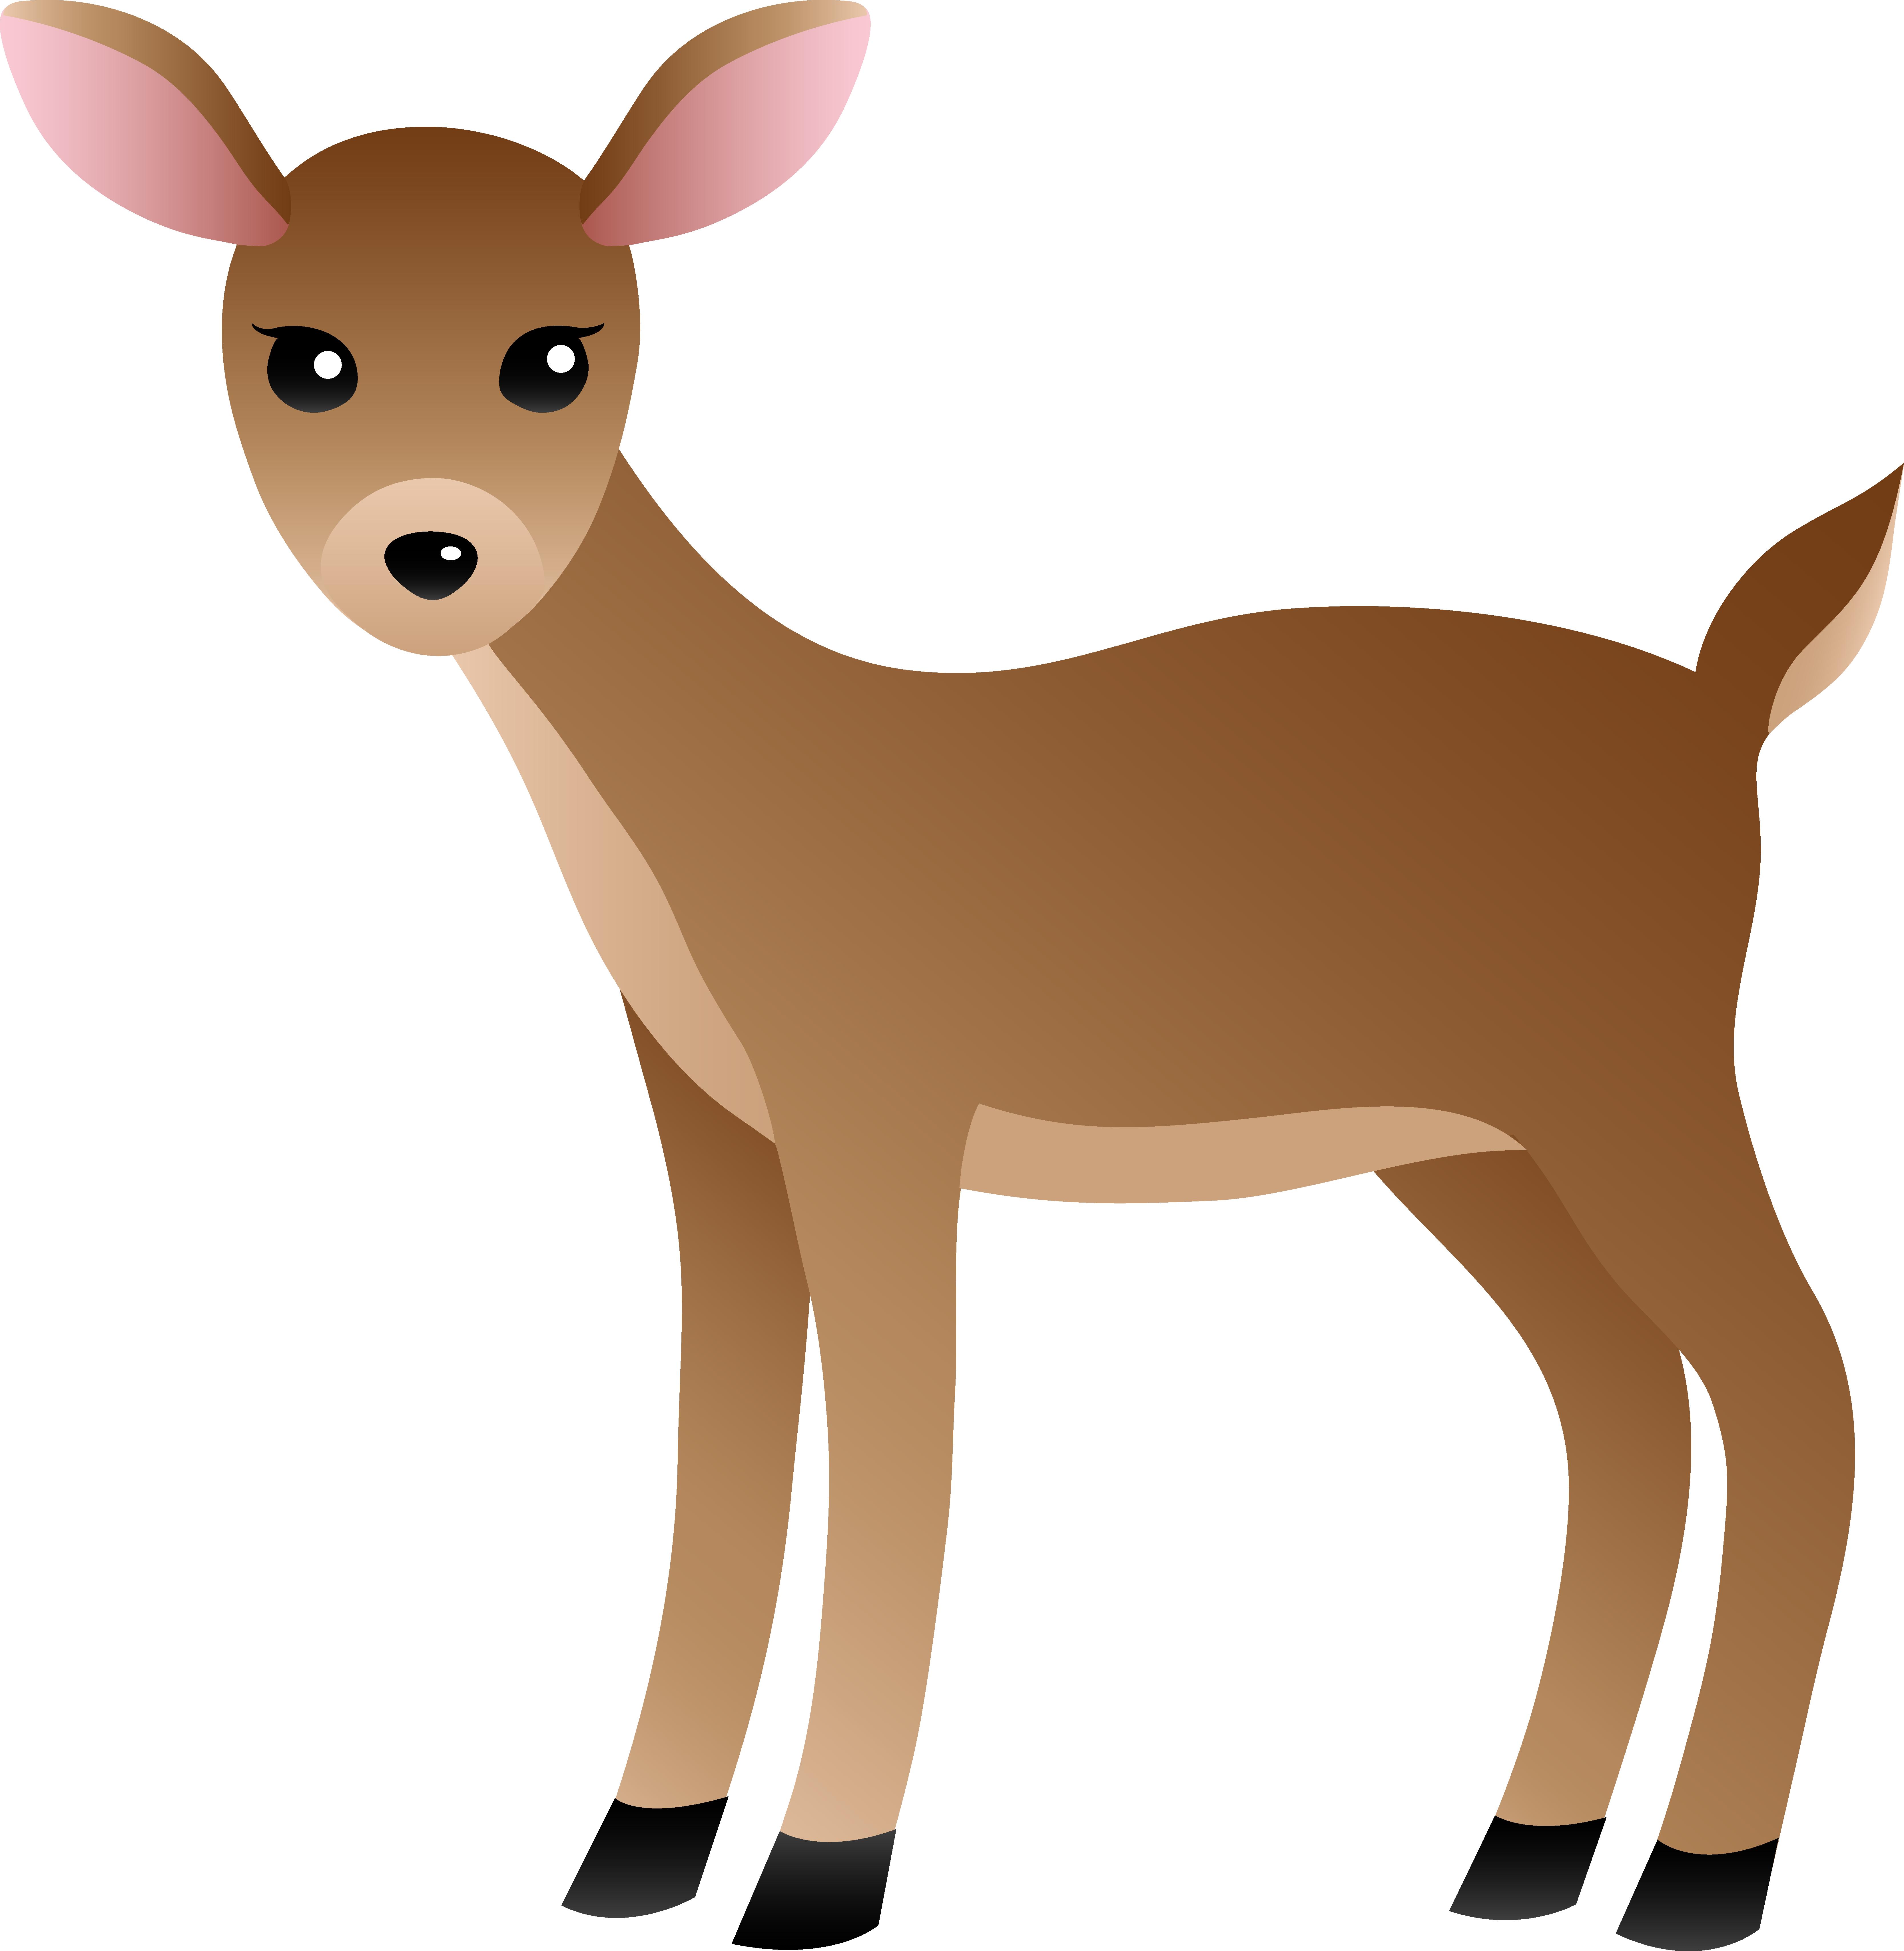 Deer clipart #2, Download drawings